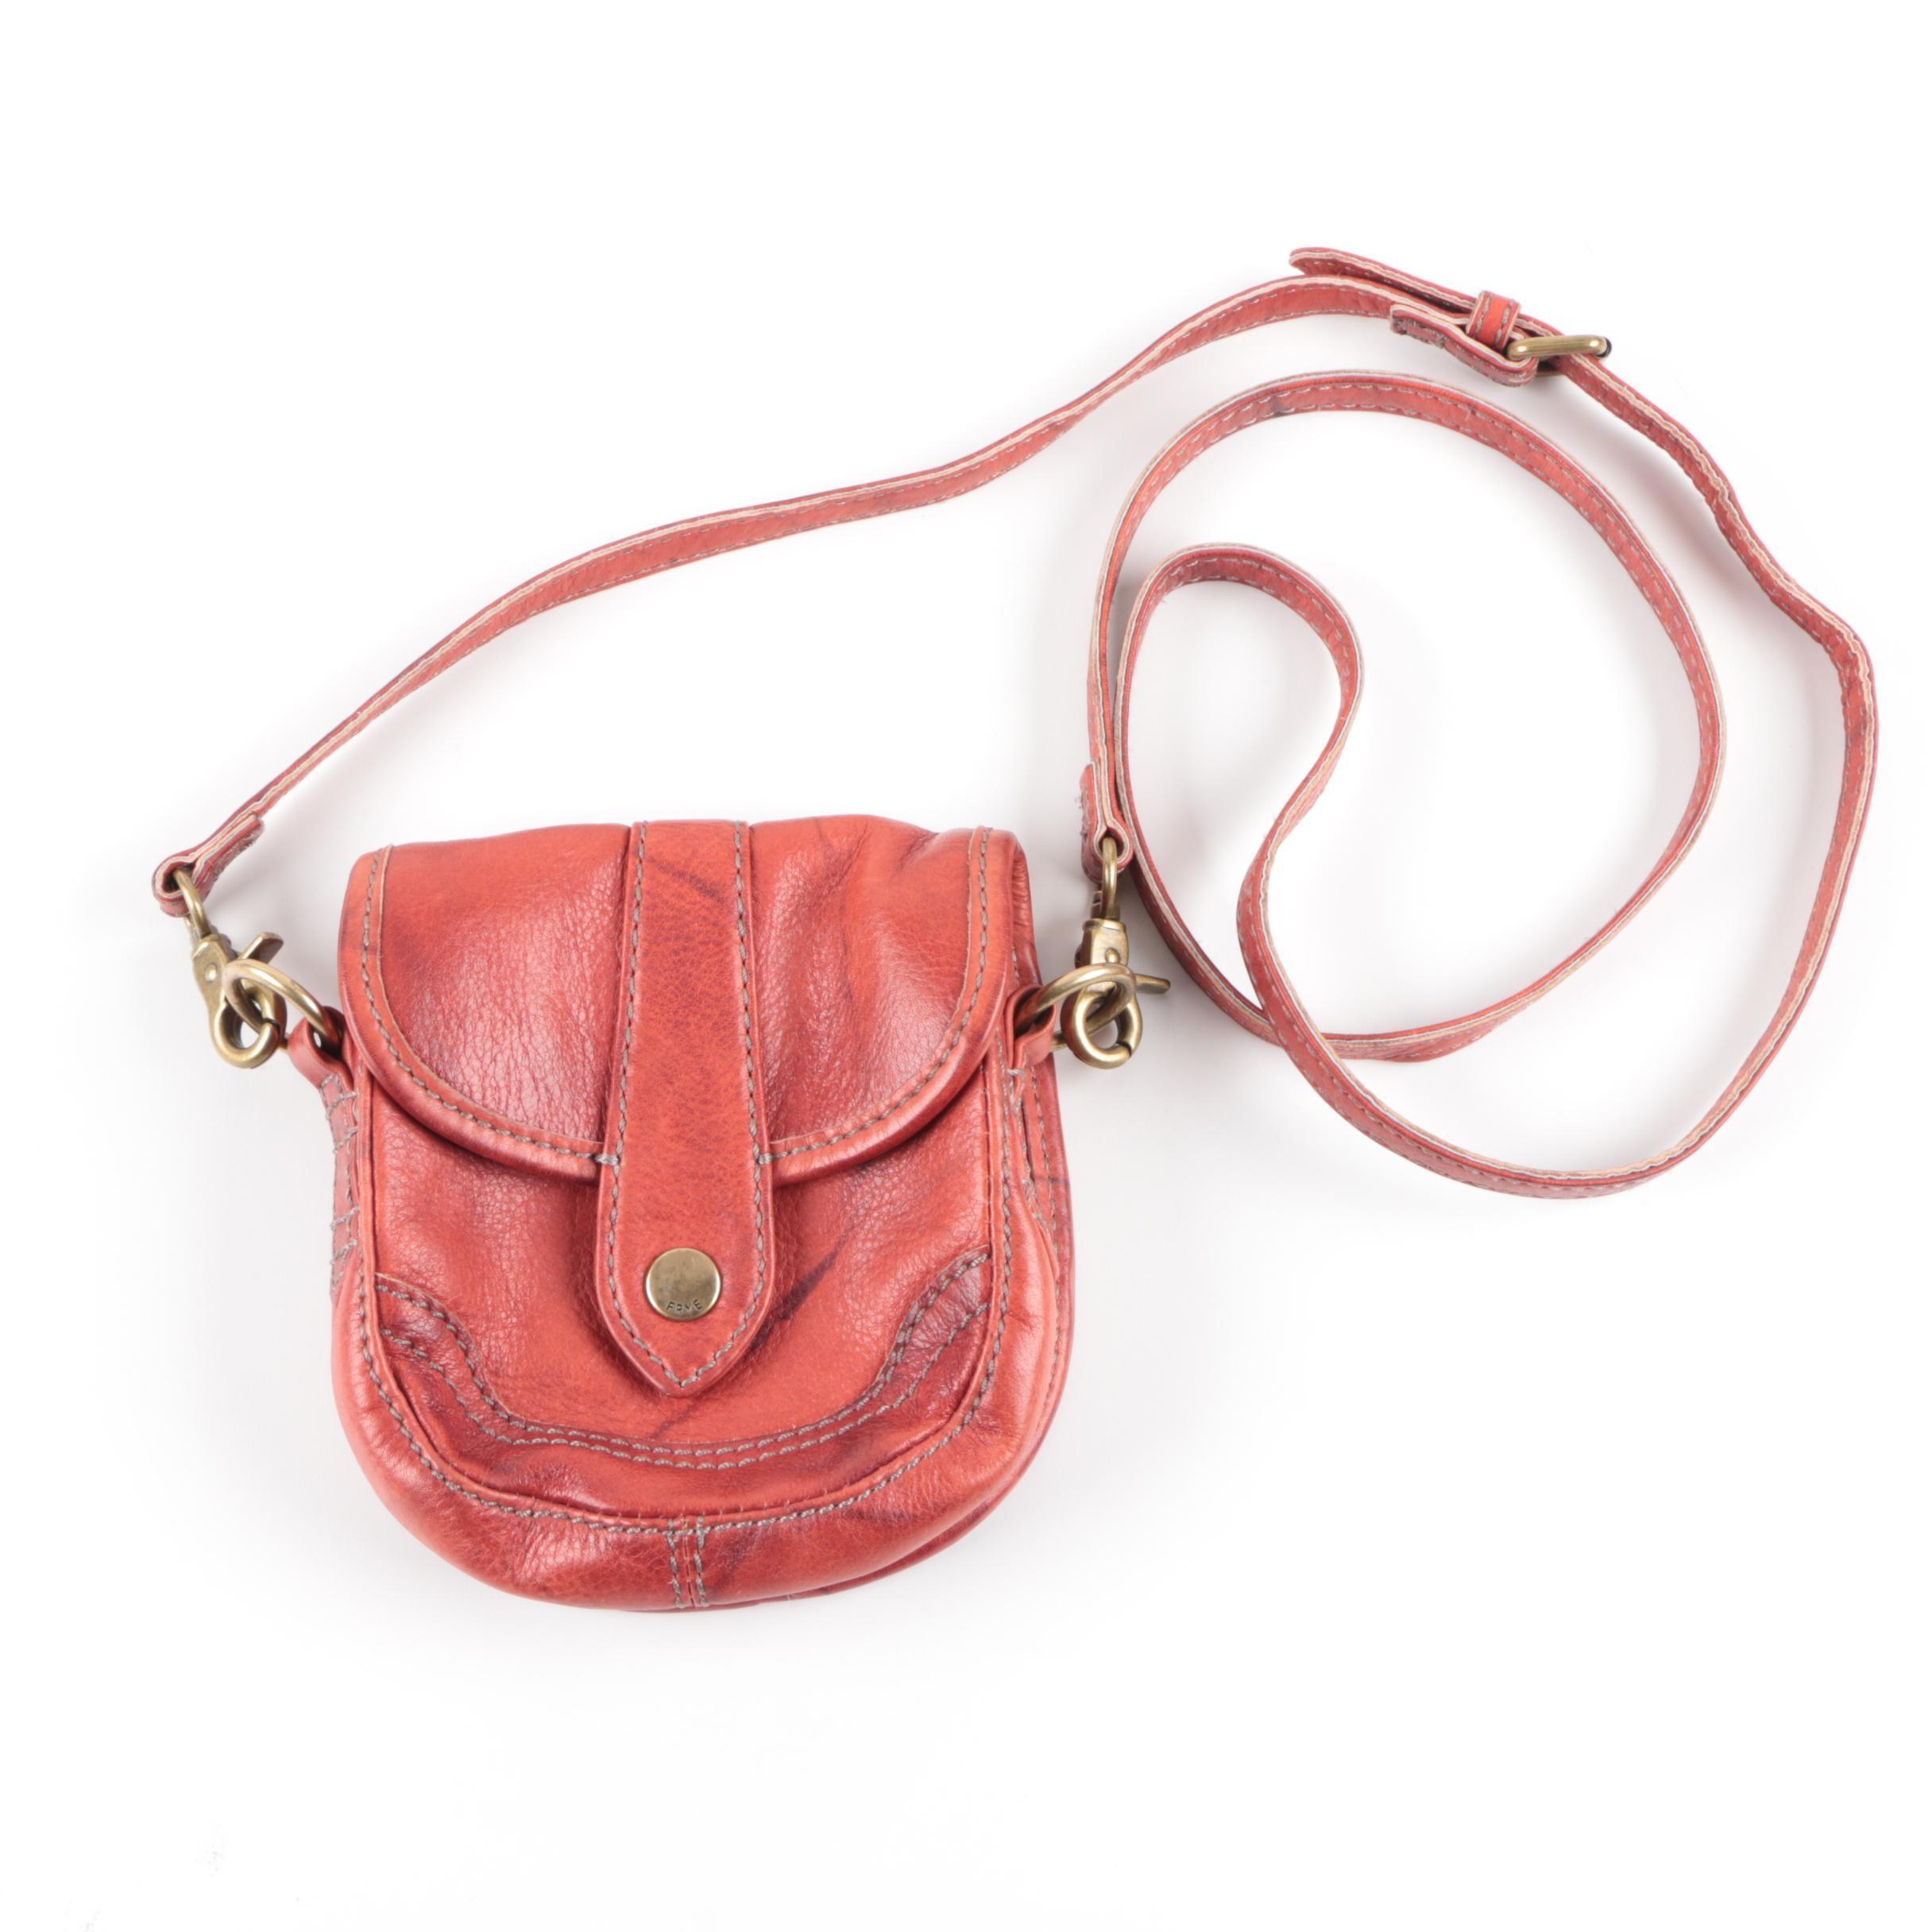 Frye Red Leather Crossbody Handbag